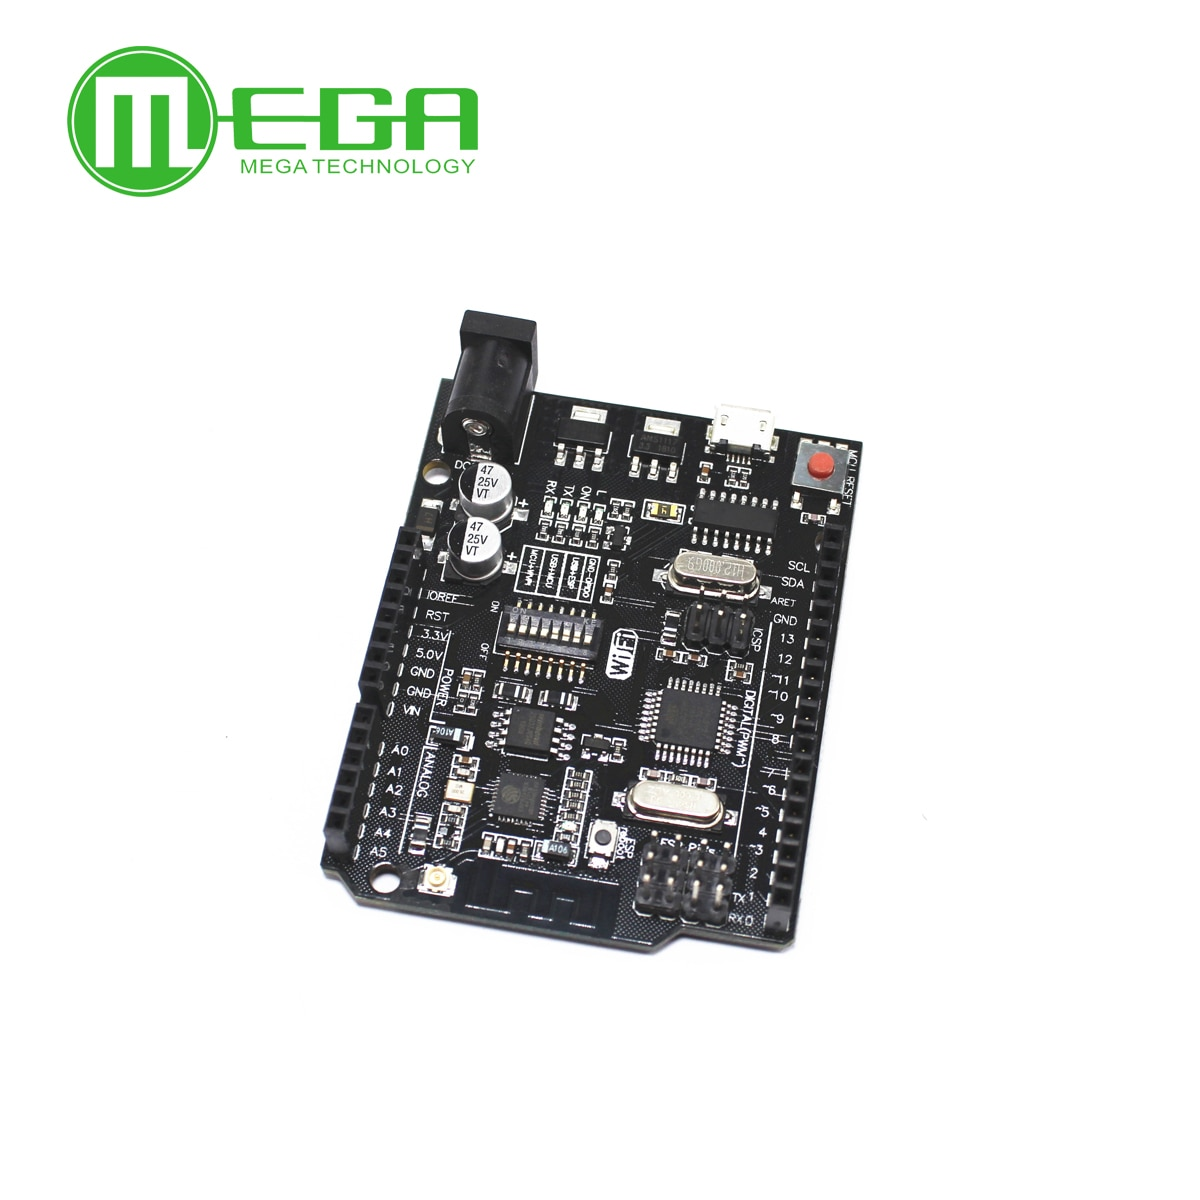 UNO R3 + WiFi ATmega328P+ESP8266 (32Mb memory) USB-TTL CH340G For Arduino Uno NodeMCU WeMos ESP8266